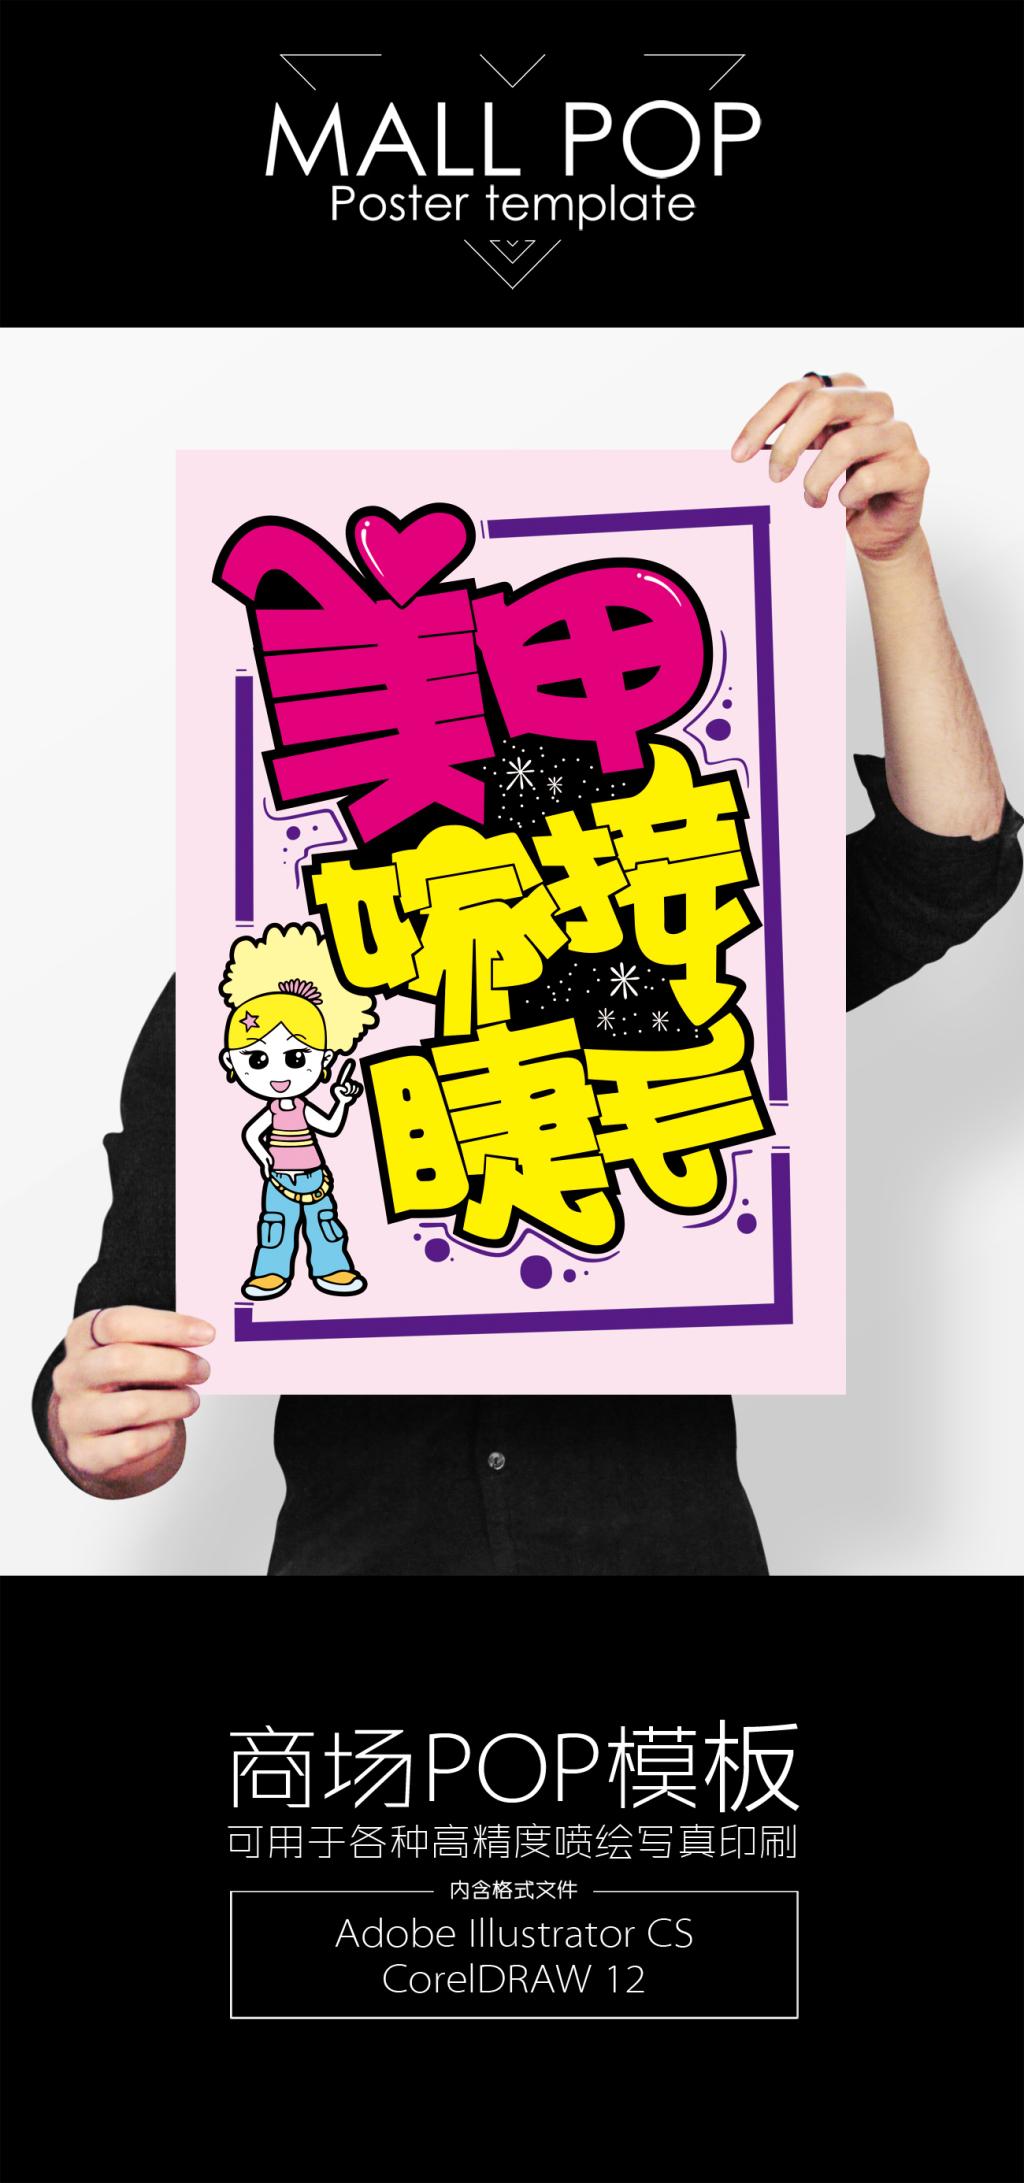 pop手绘海报美容美甲图片素材 CDR格式 下载 POP海报大全